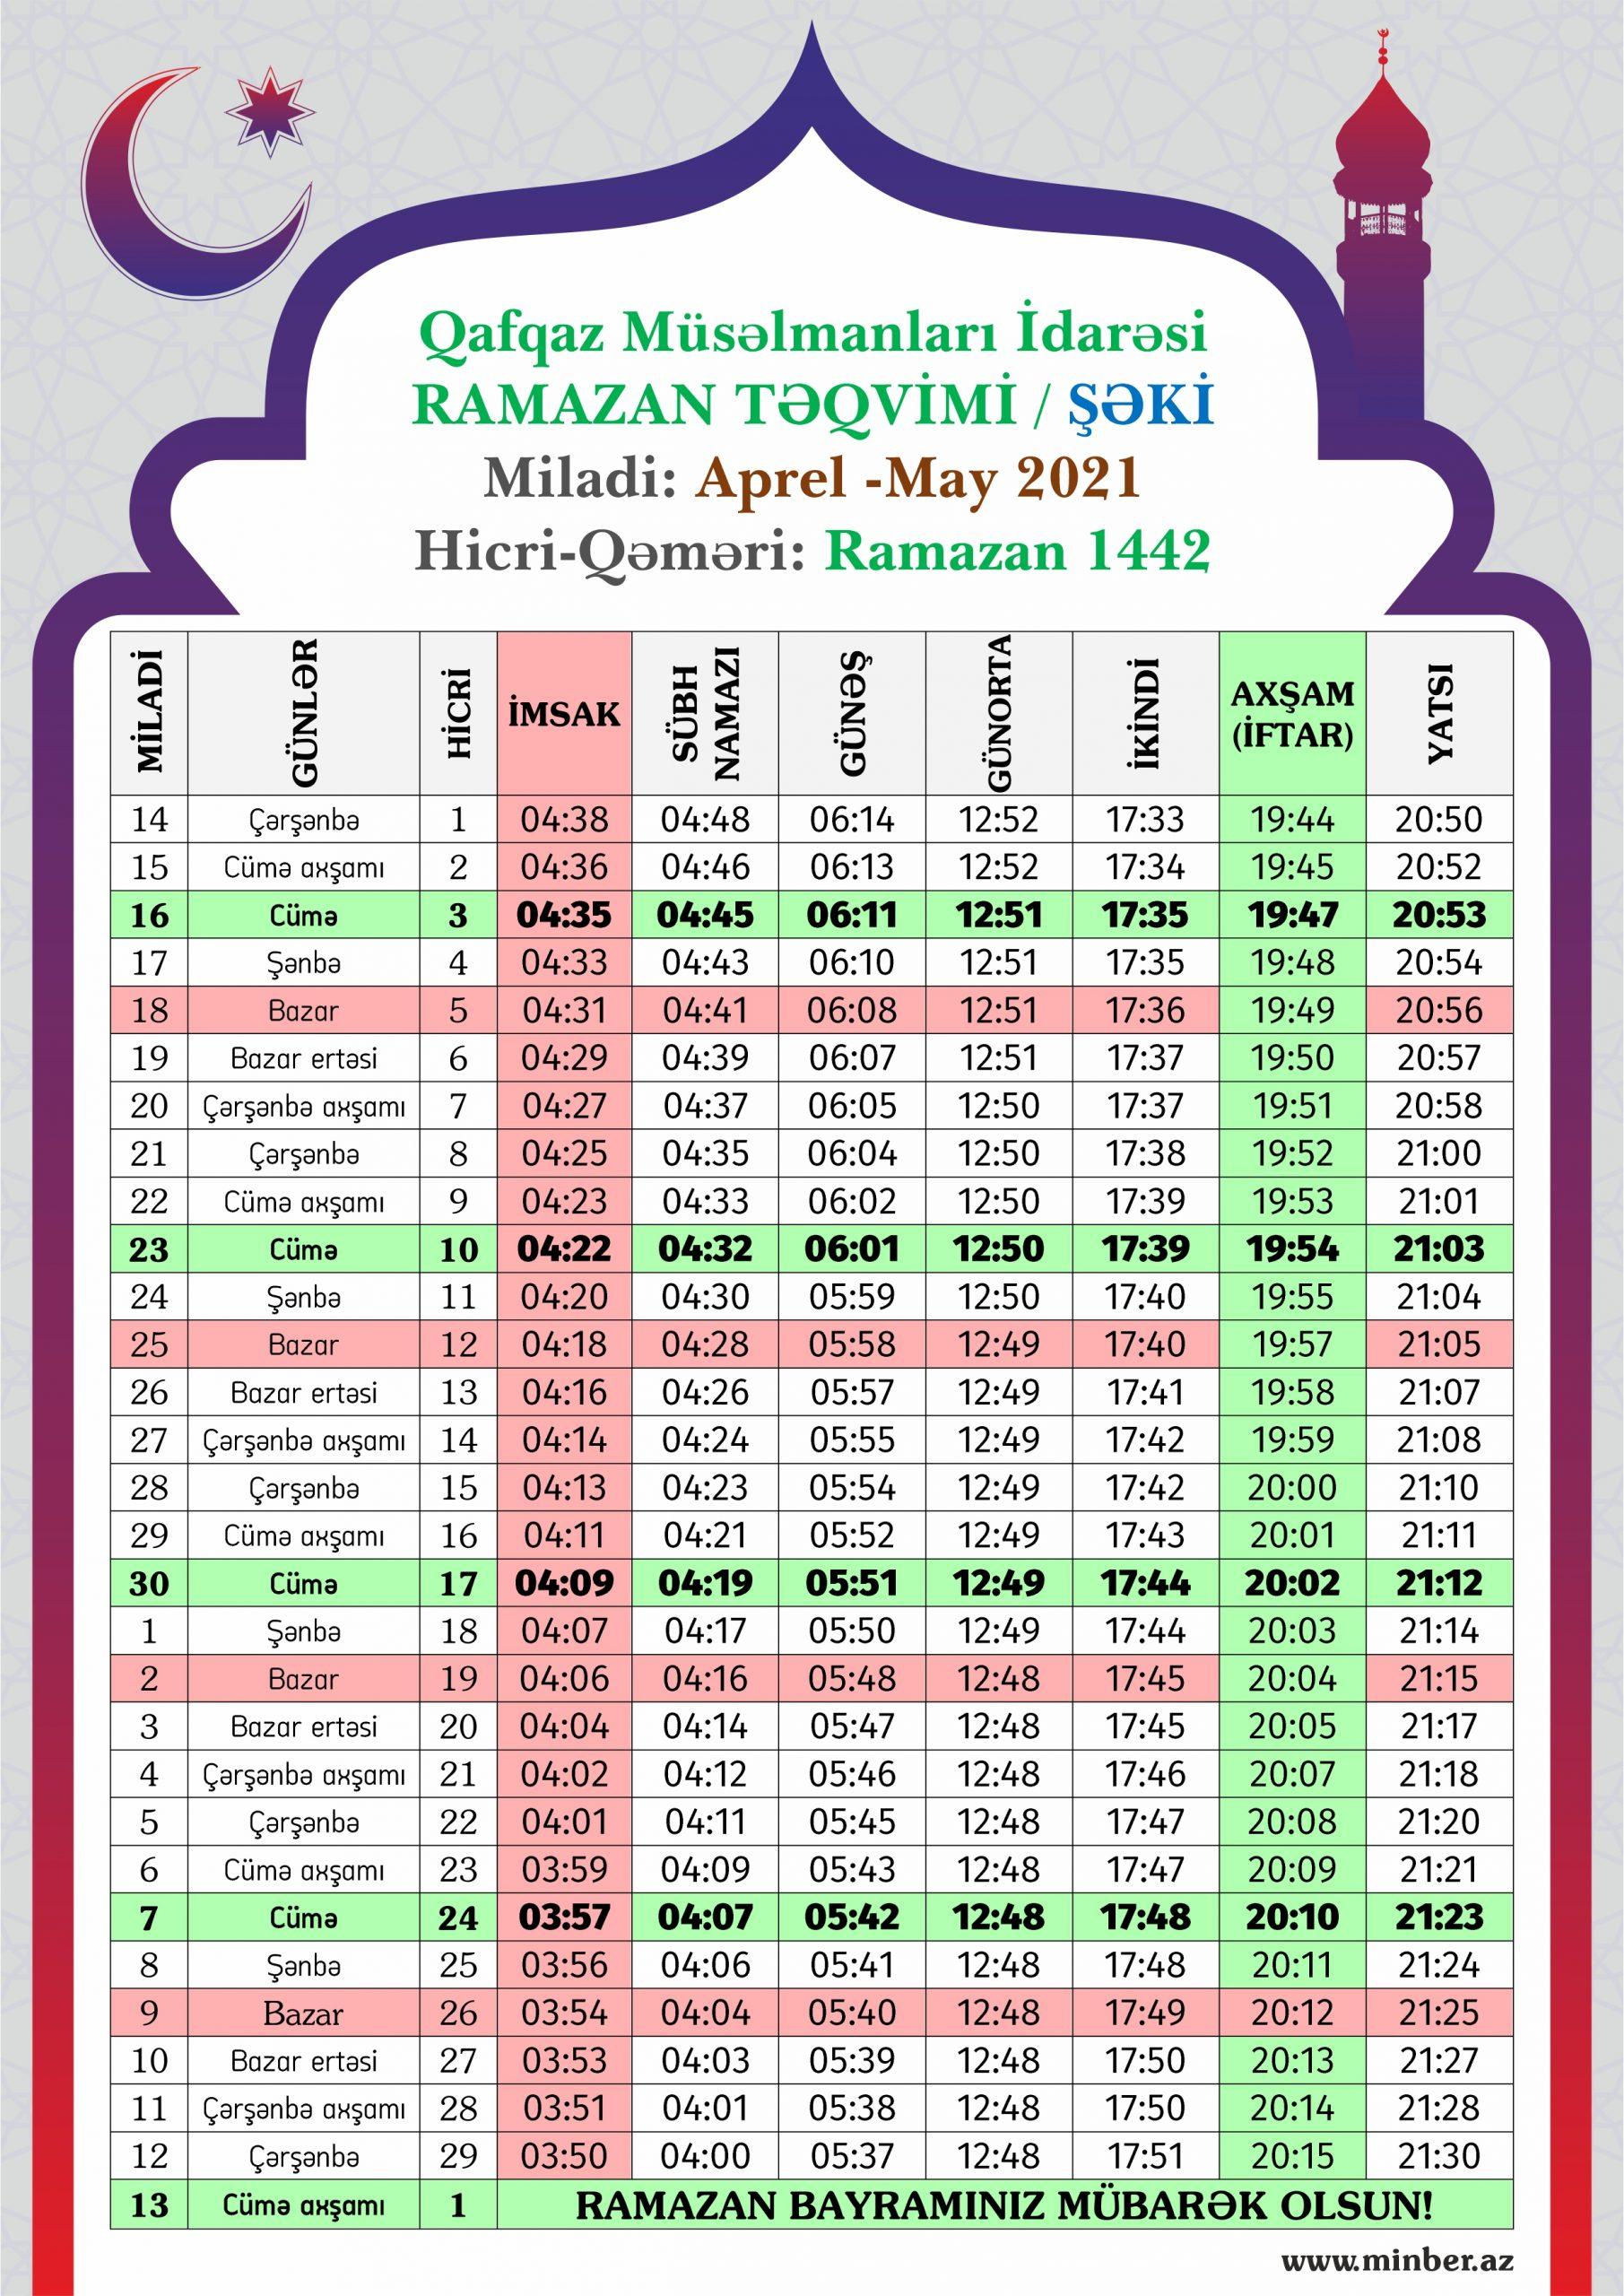 Ramazan 2021